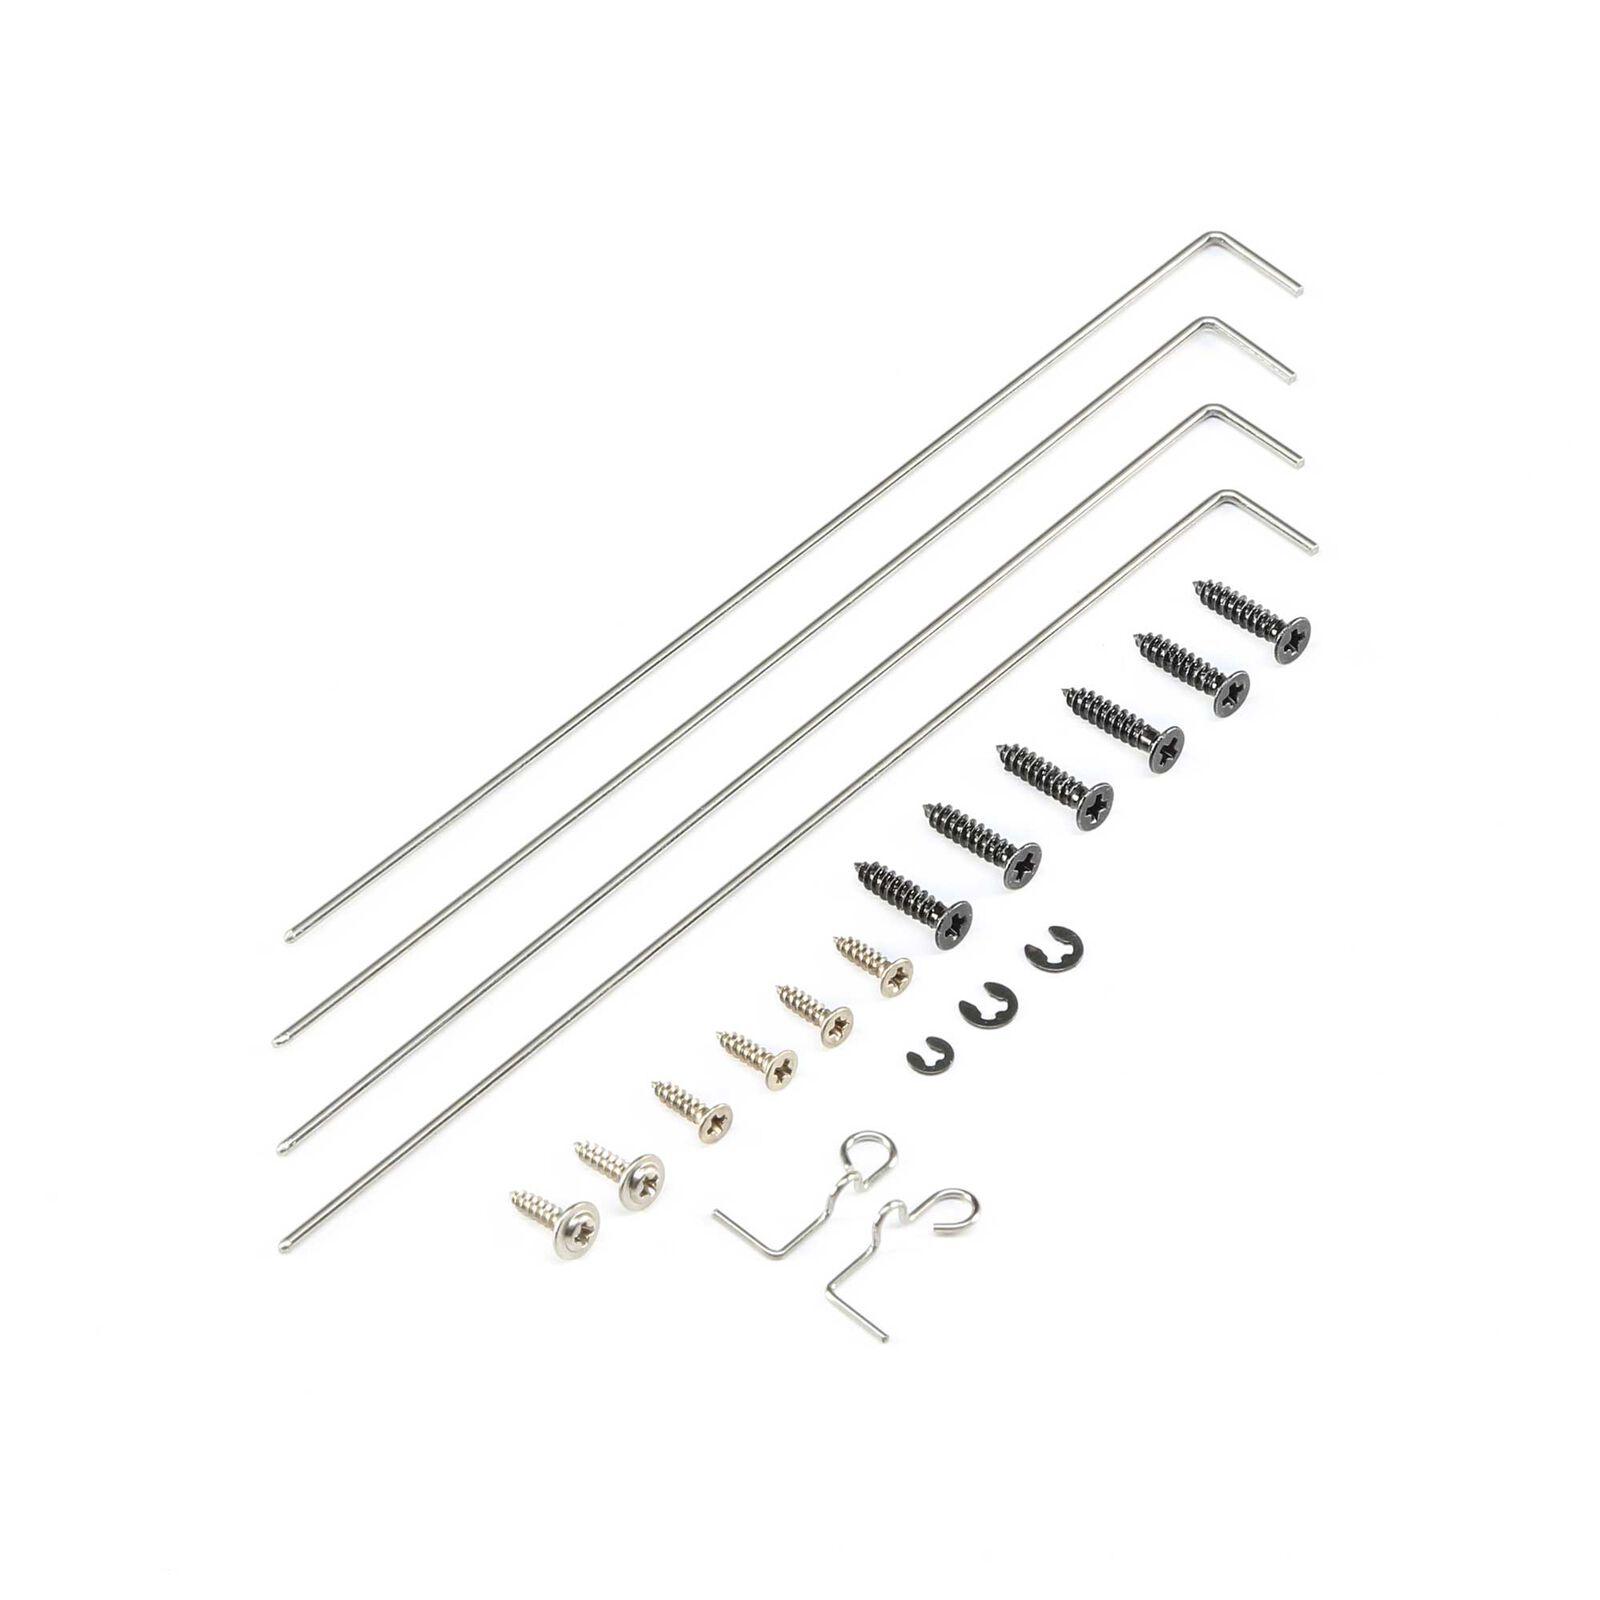 Hardware Set: PT-17 1.1m